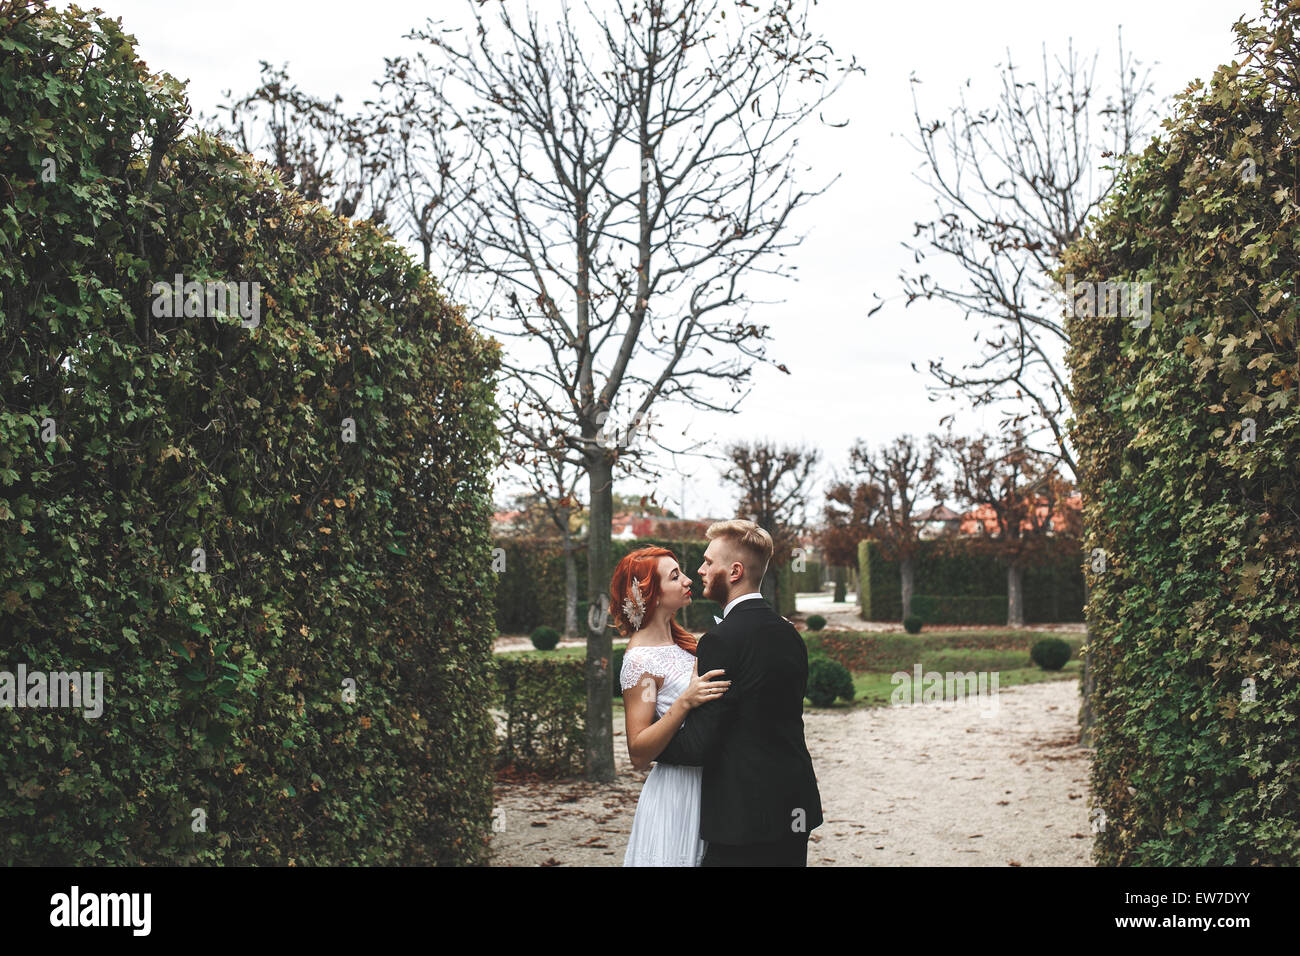 Wedding couple on a walk - Stock Image